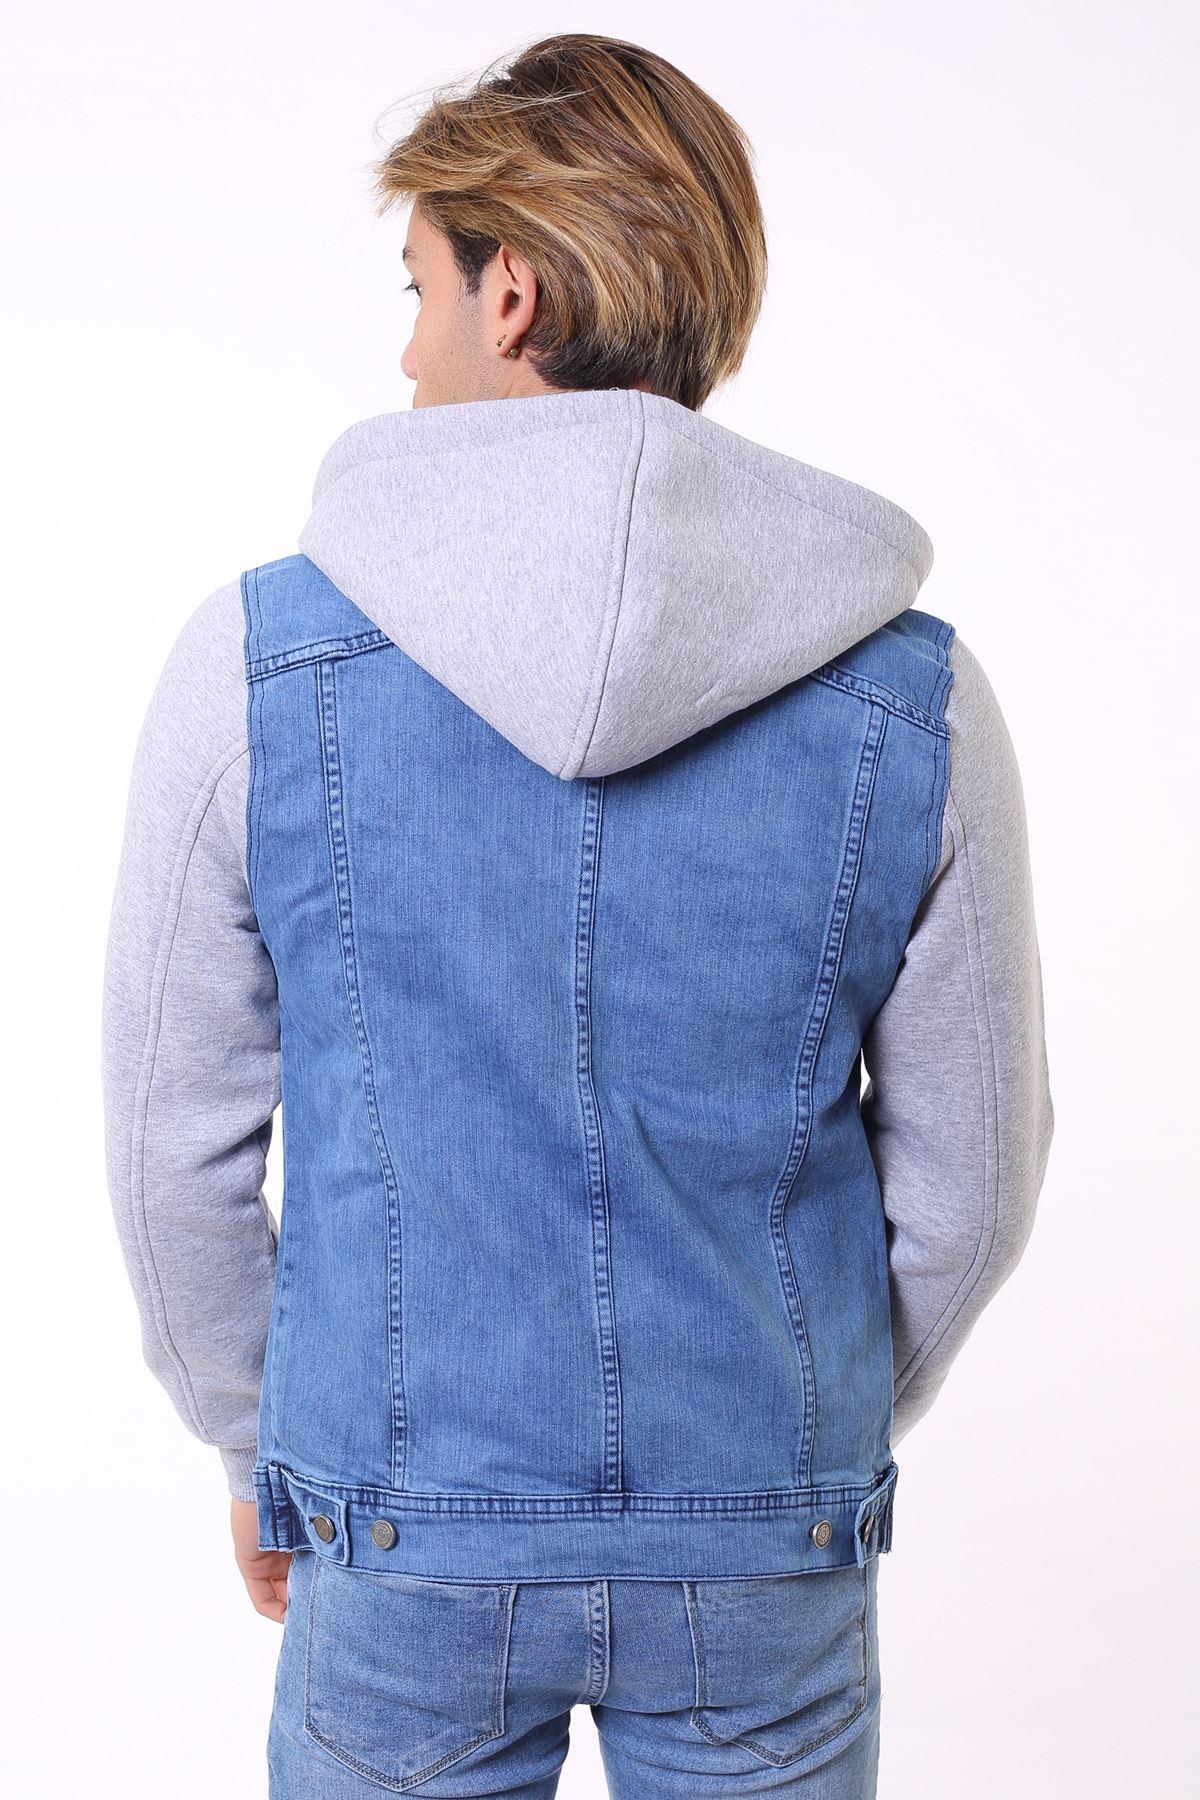 Açık Mavi Kapüşonlu Erkek Kot Ceket